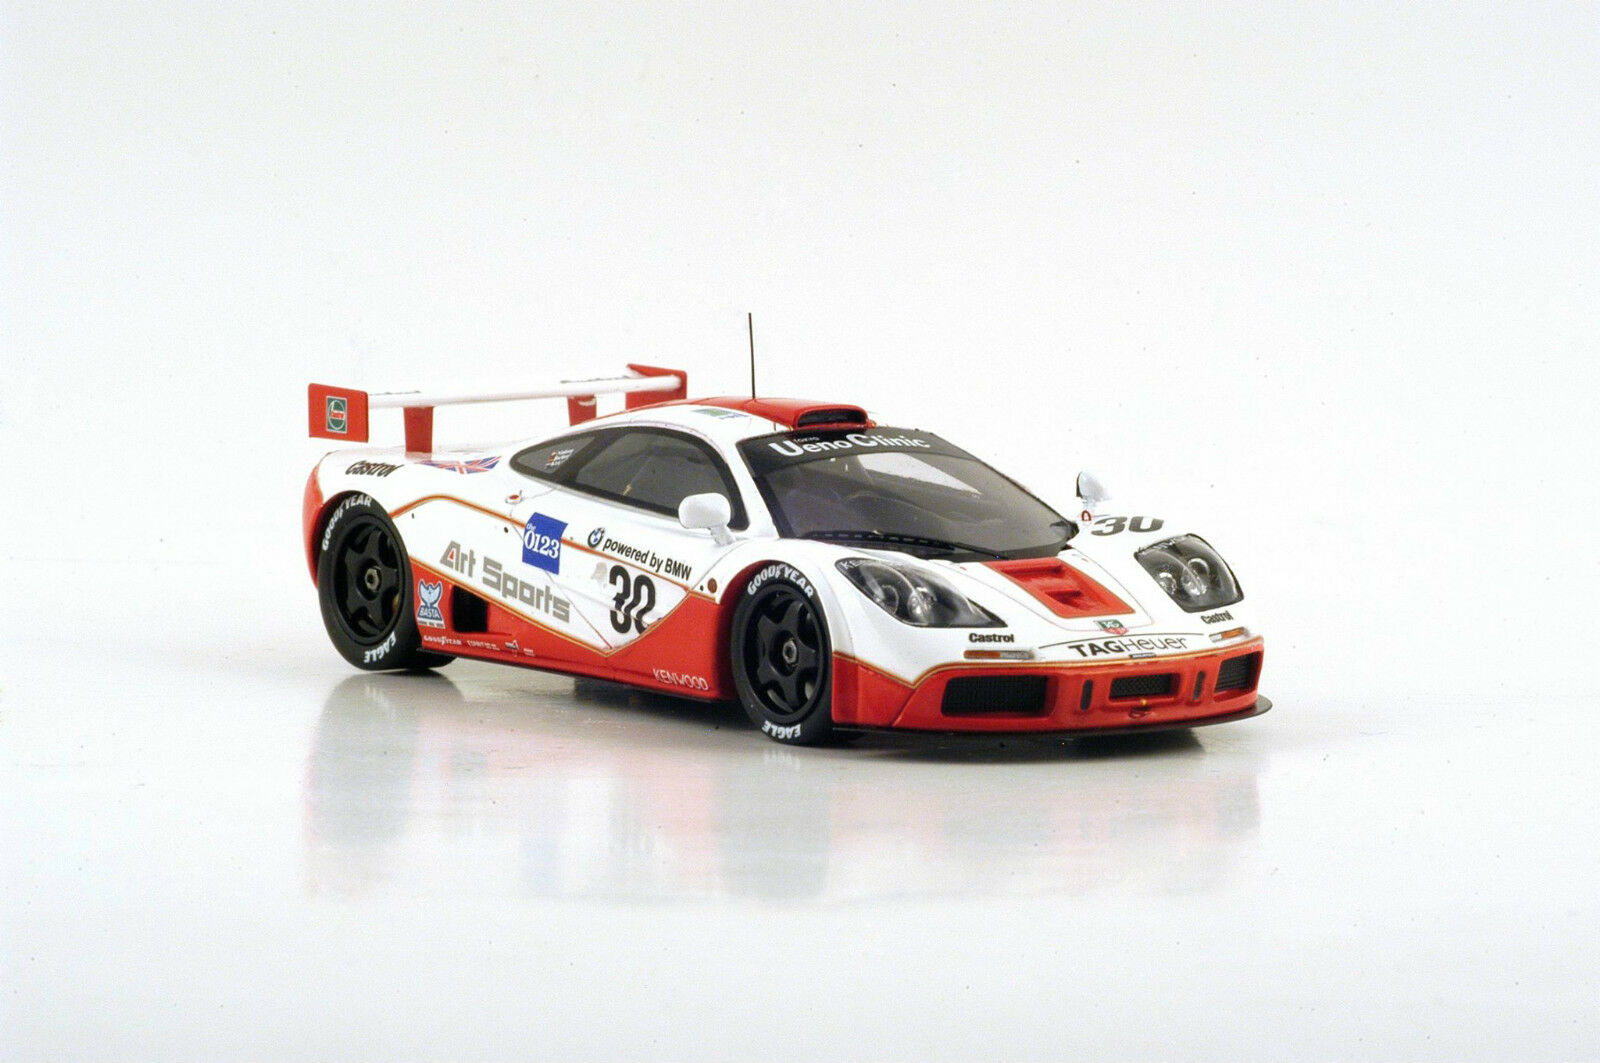 S4405 Spark 1/43:McLaren F1 GTR n.30 4th Le Mans 1996 J. Nielsen -Bscher- P. Kox